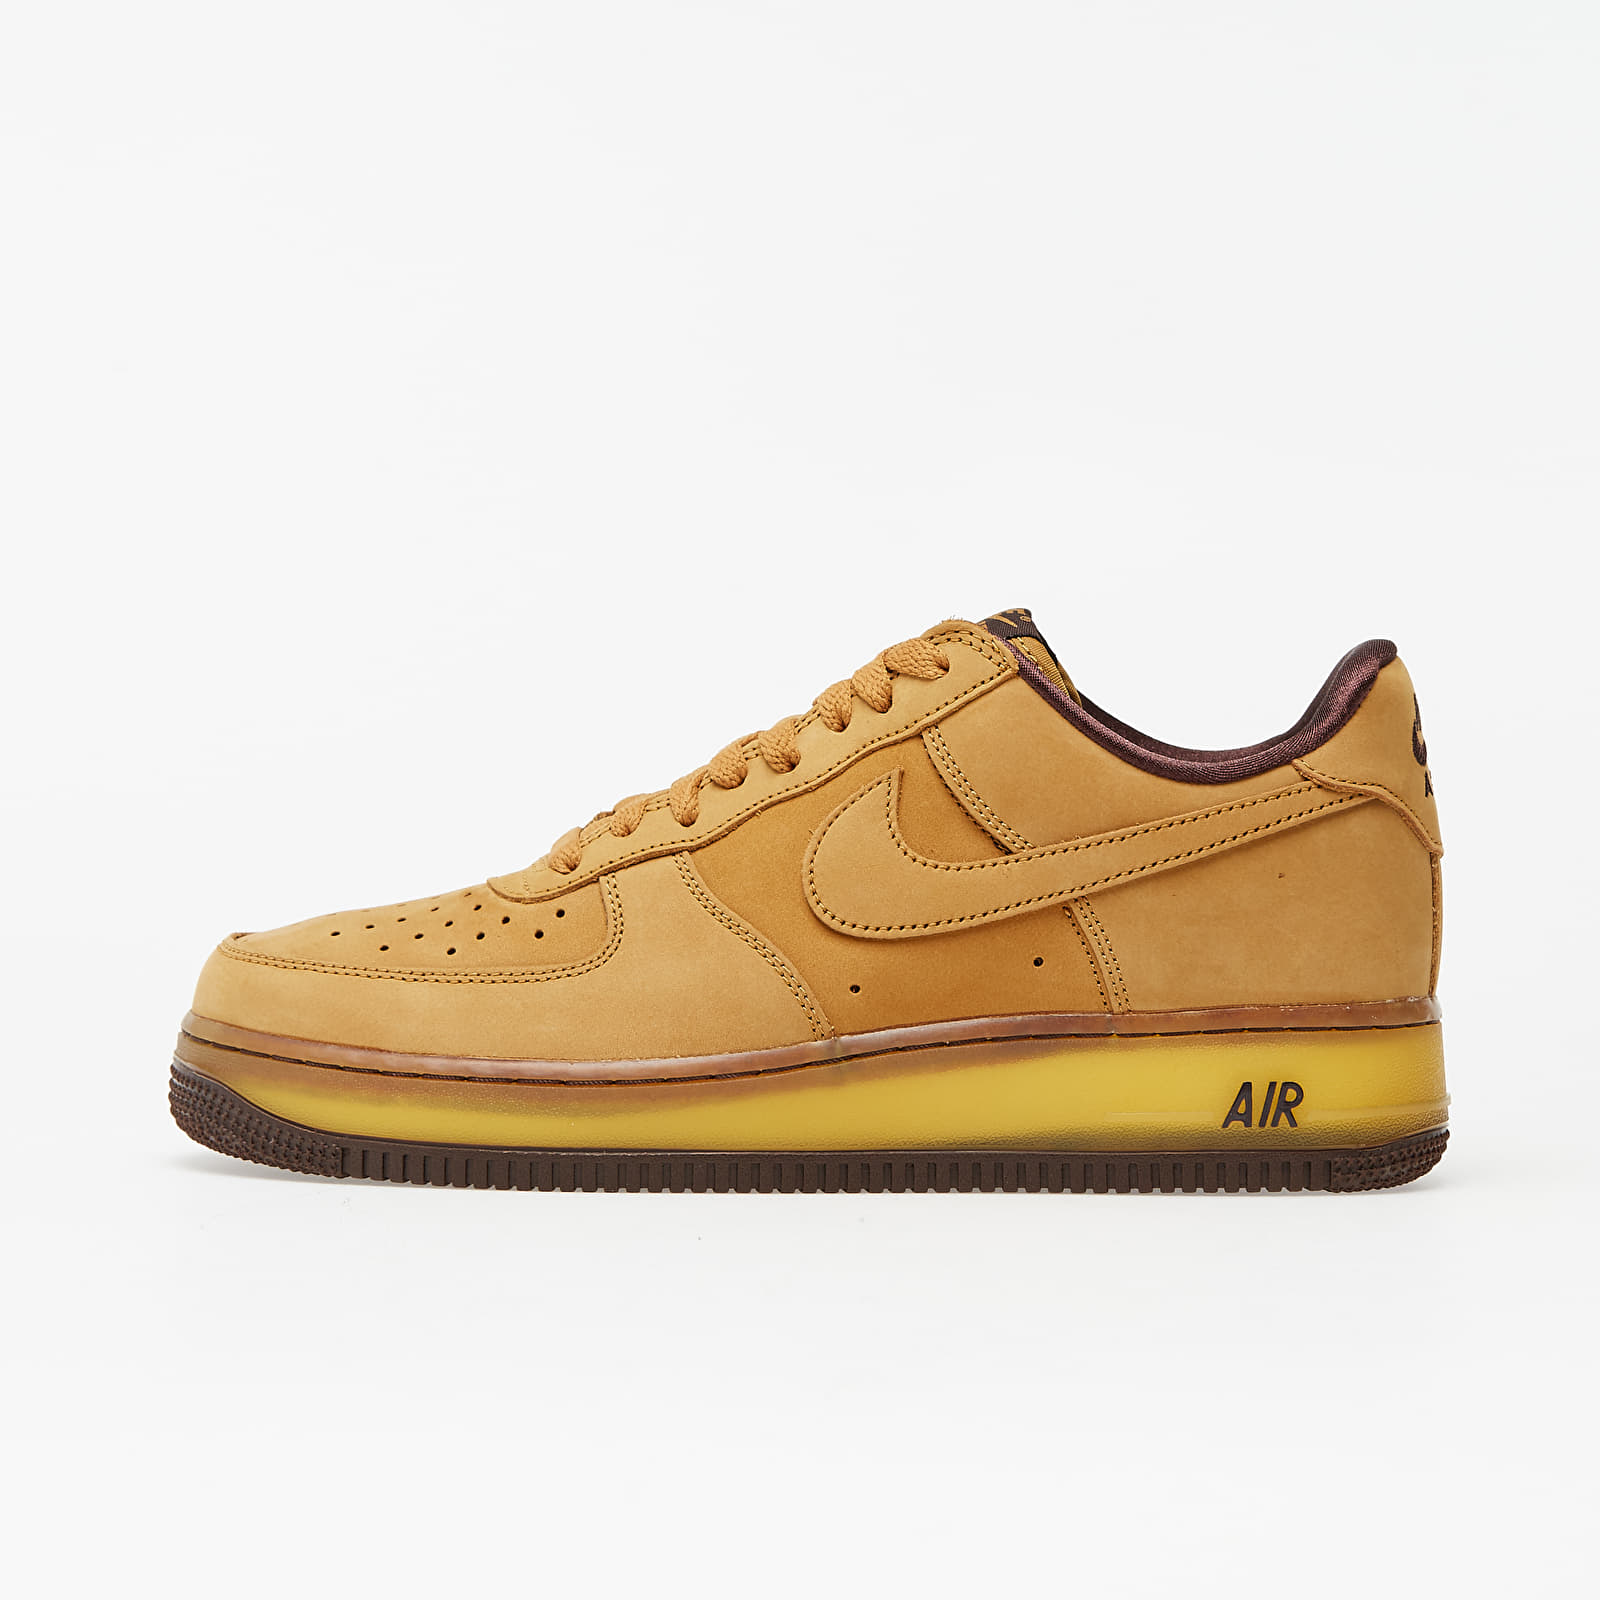 Pánské tenisky a boty Nike Air Force 1 Low Retro SP Wheat/ Wheat-Dark Mocha